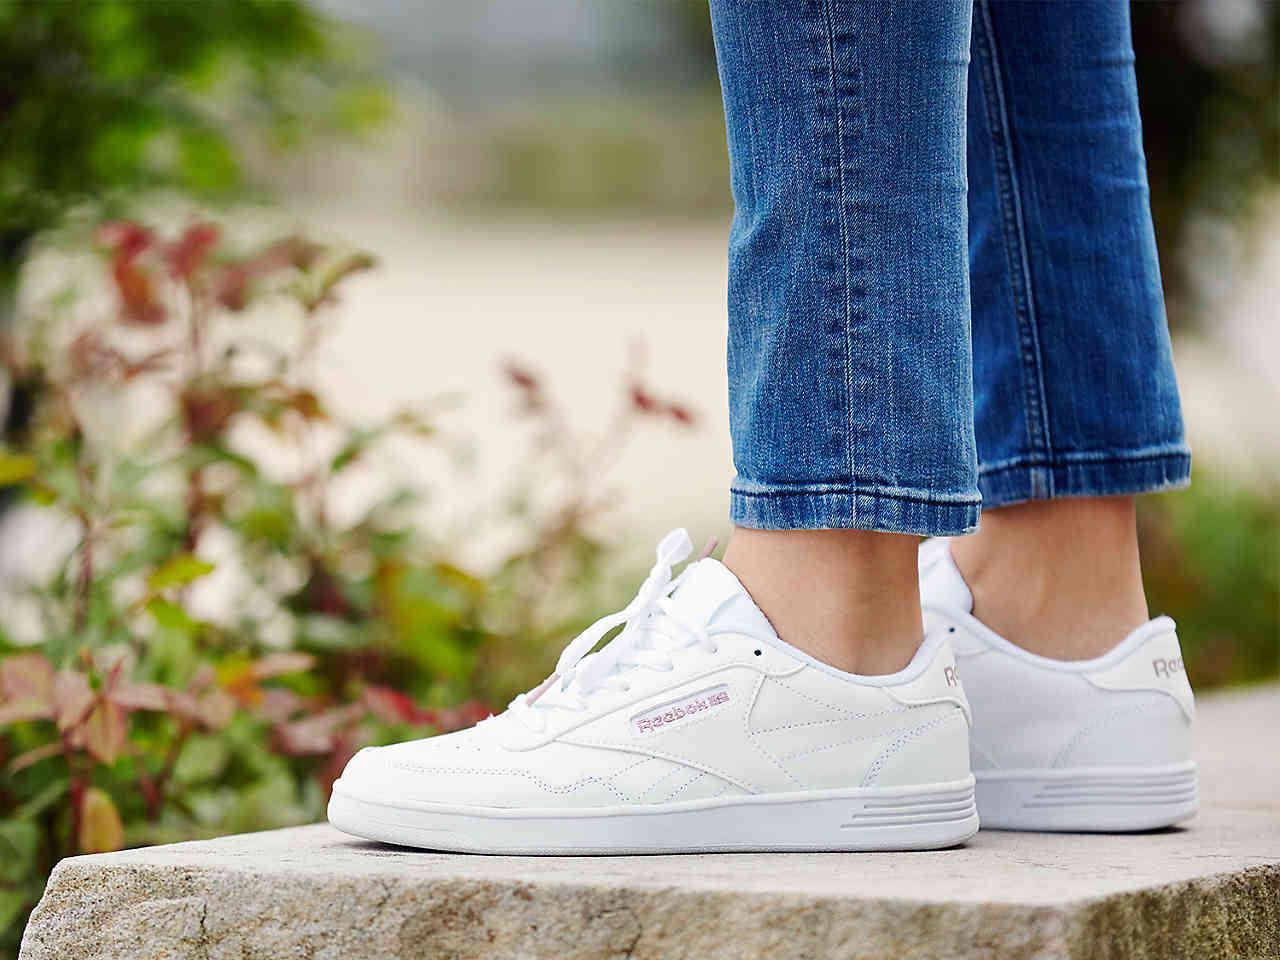 10db11ddb9d0 Lyst - Reebok Club Memt Sneaker in White